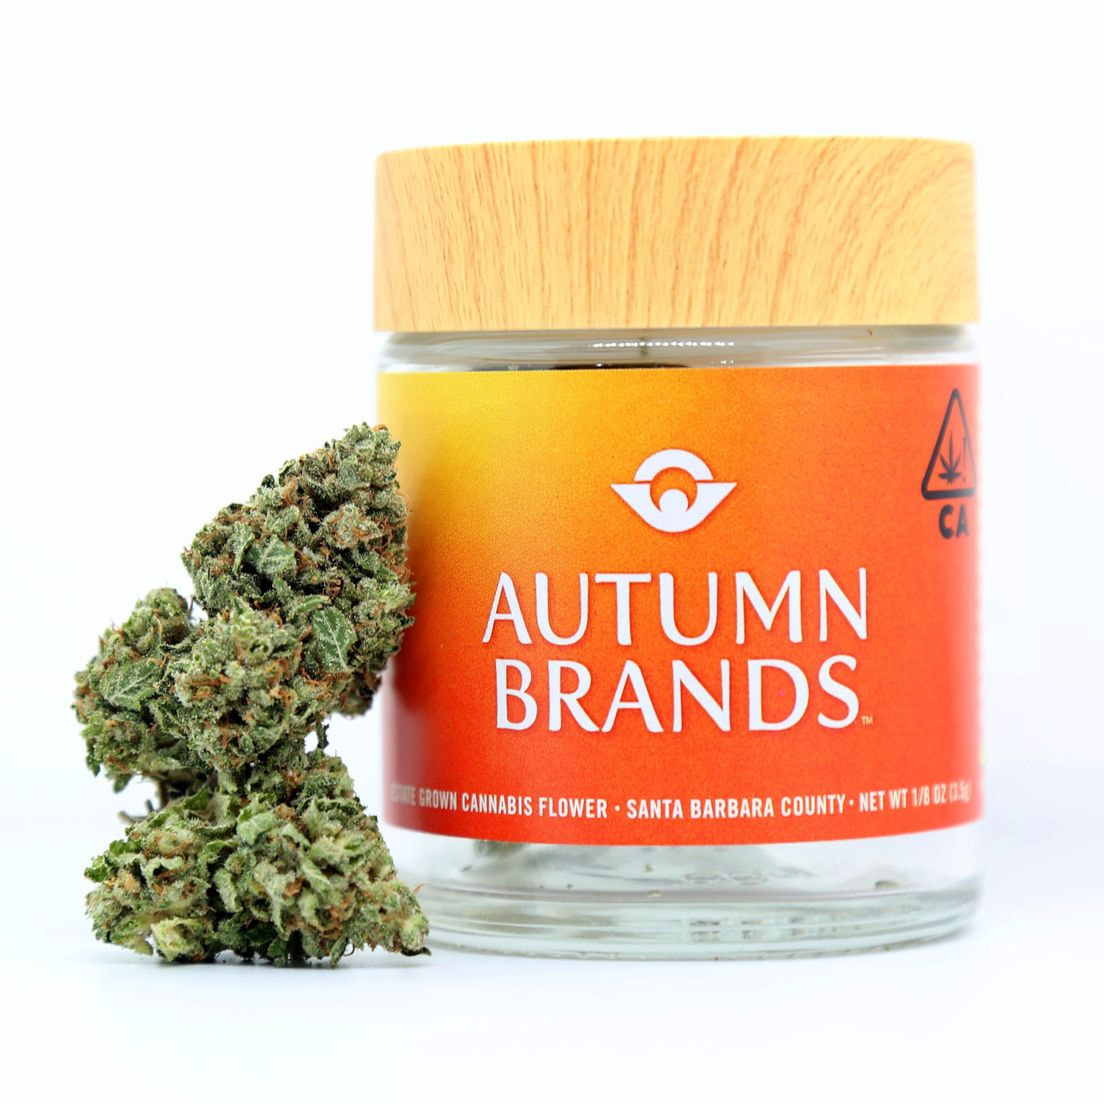 B. Autumn Brands 3.5g Flower - Quality 8/10 - Mother's Milk (~24%)